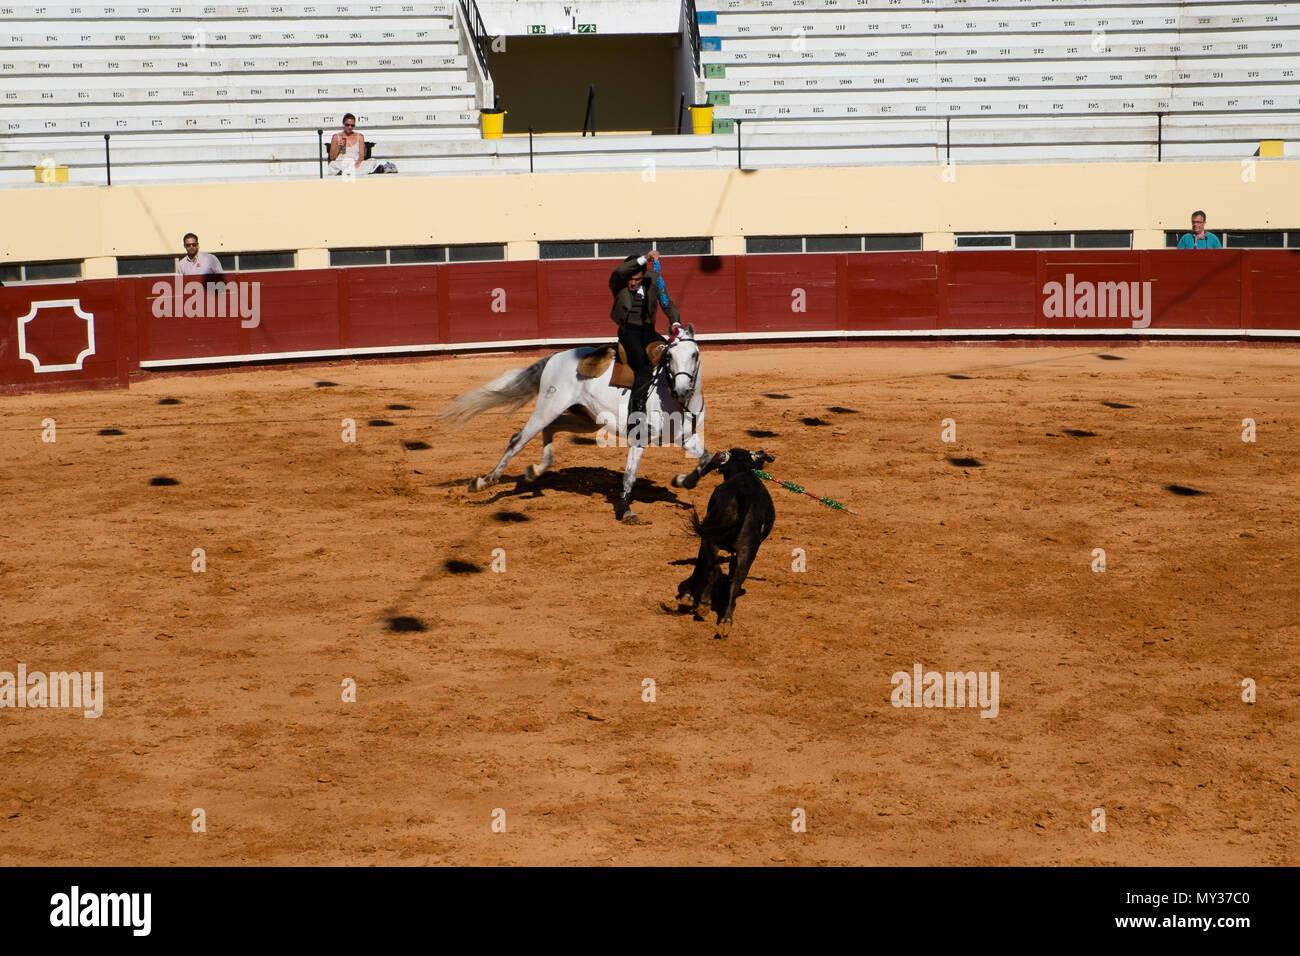 bullfighting Praça de Toiros de Albufeira Portugal - Stock Image